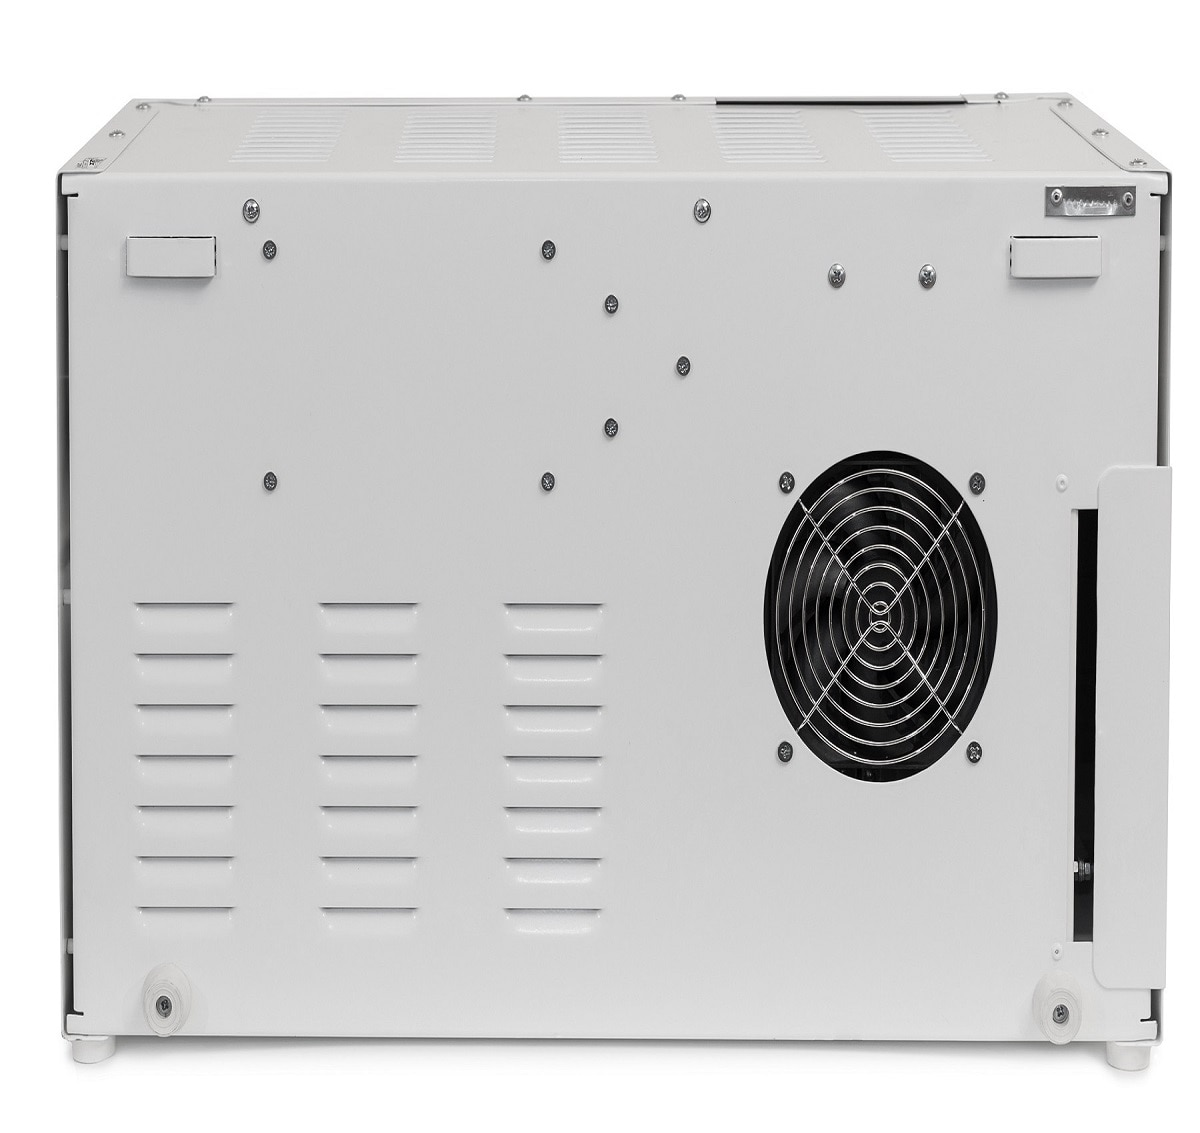 Стабилизаторы напряжения - Стабилизатор напряжения 15 кВт РRIME 000001458 - Фото 2